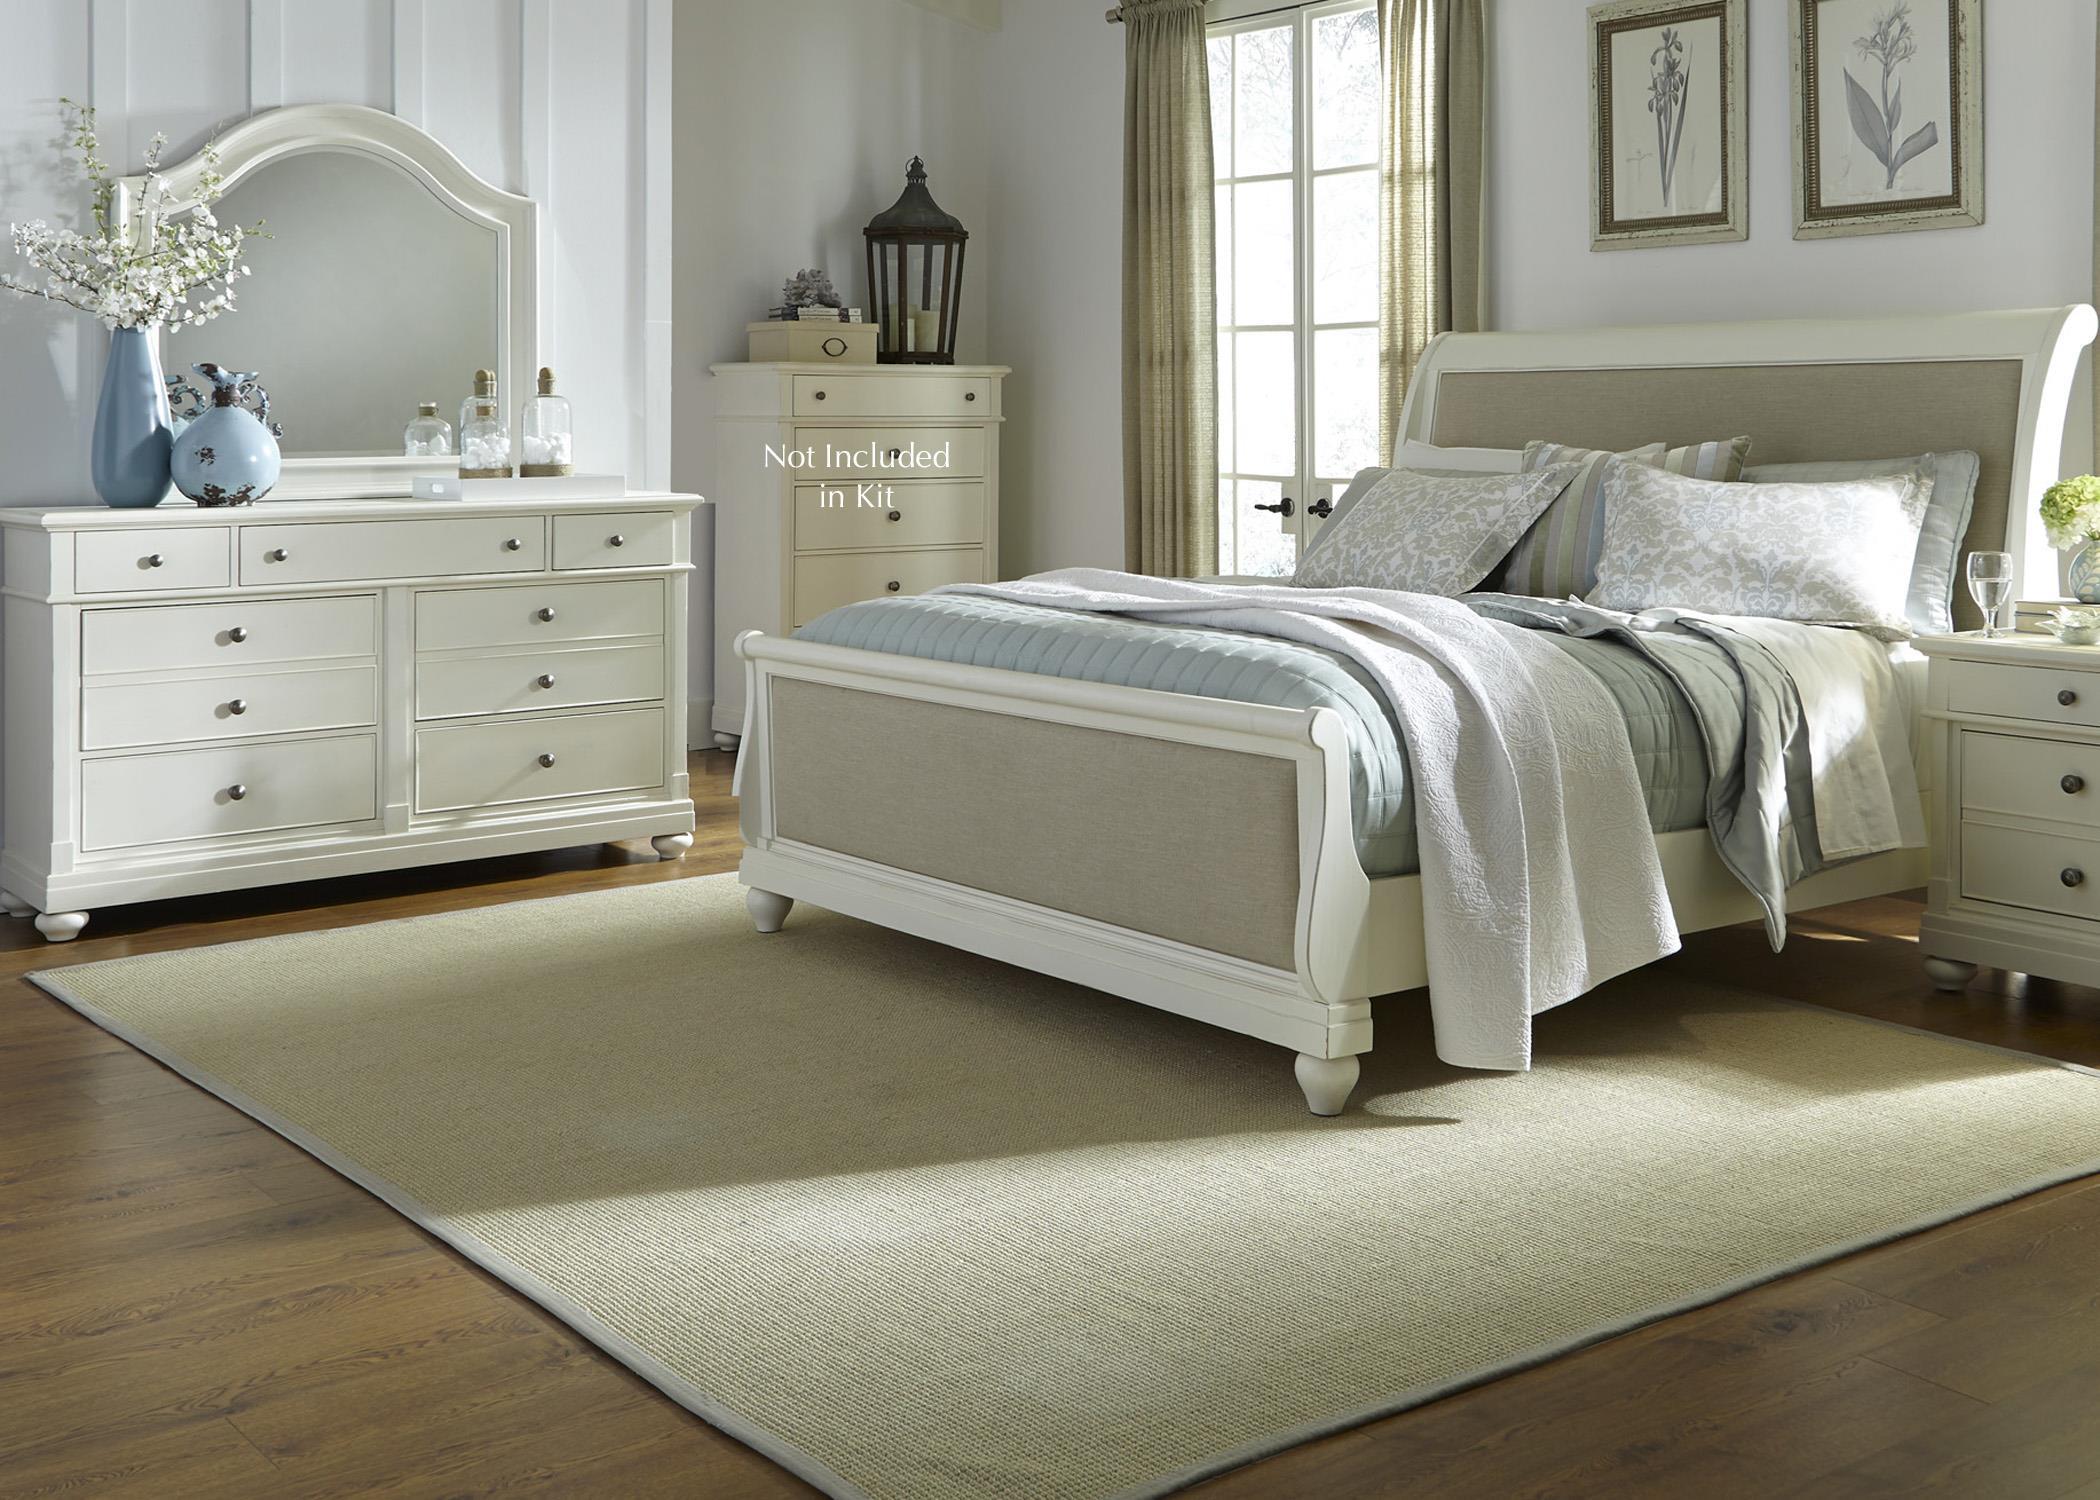 Liberty Furniture Harbor View Queen Bedroom Group - Item Number: 631-BR-QSLDM